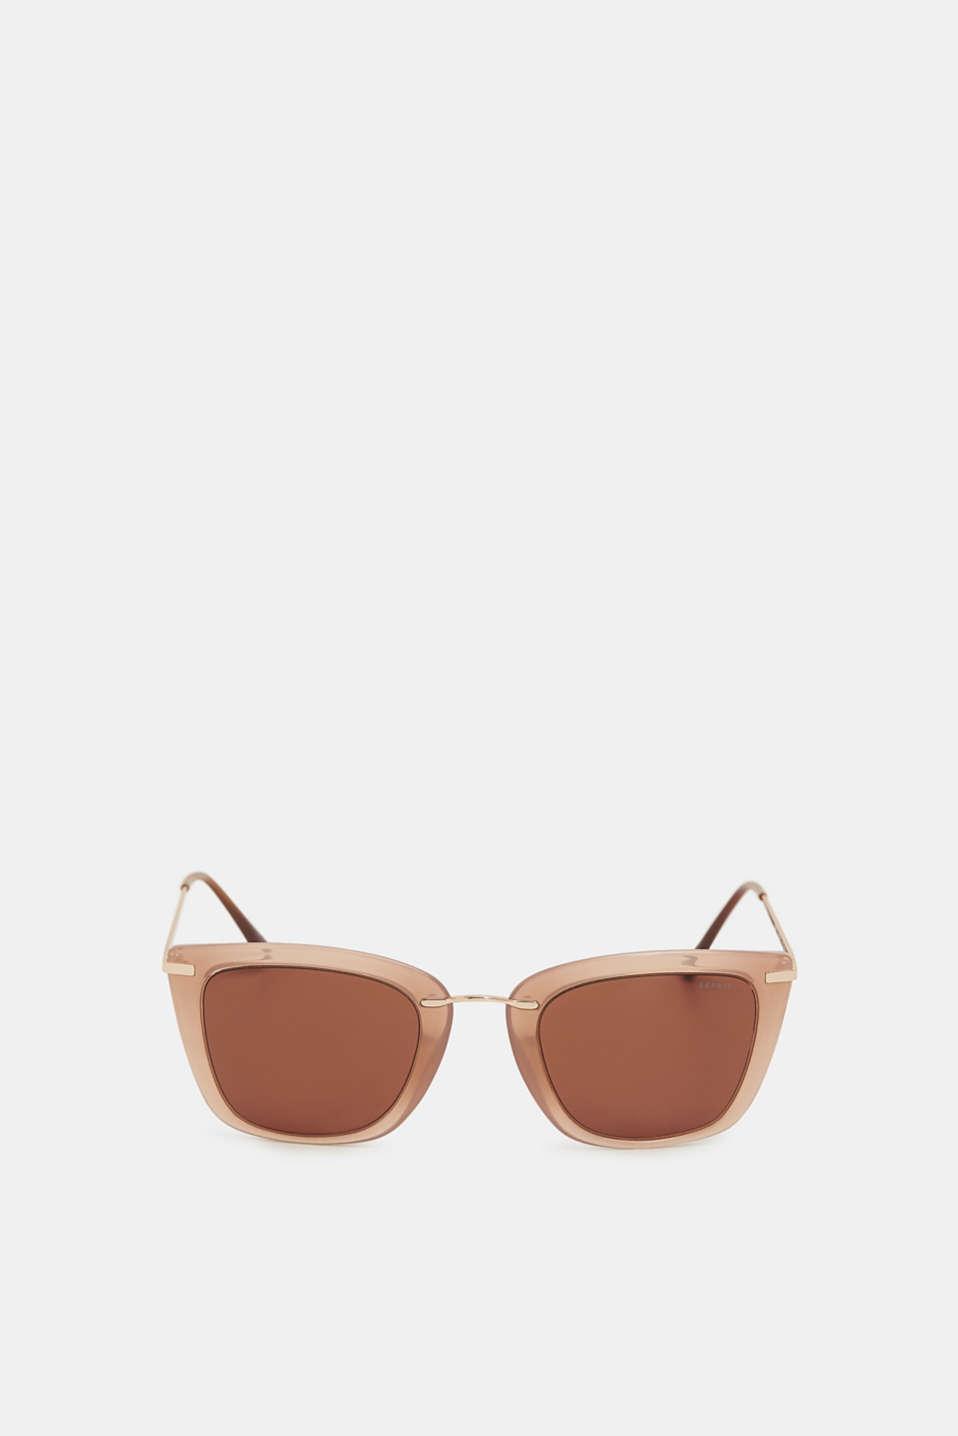 Fine wire frame sunglasses, BEIGE, detail image number 1